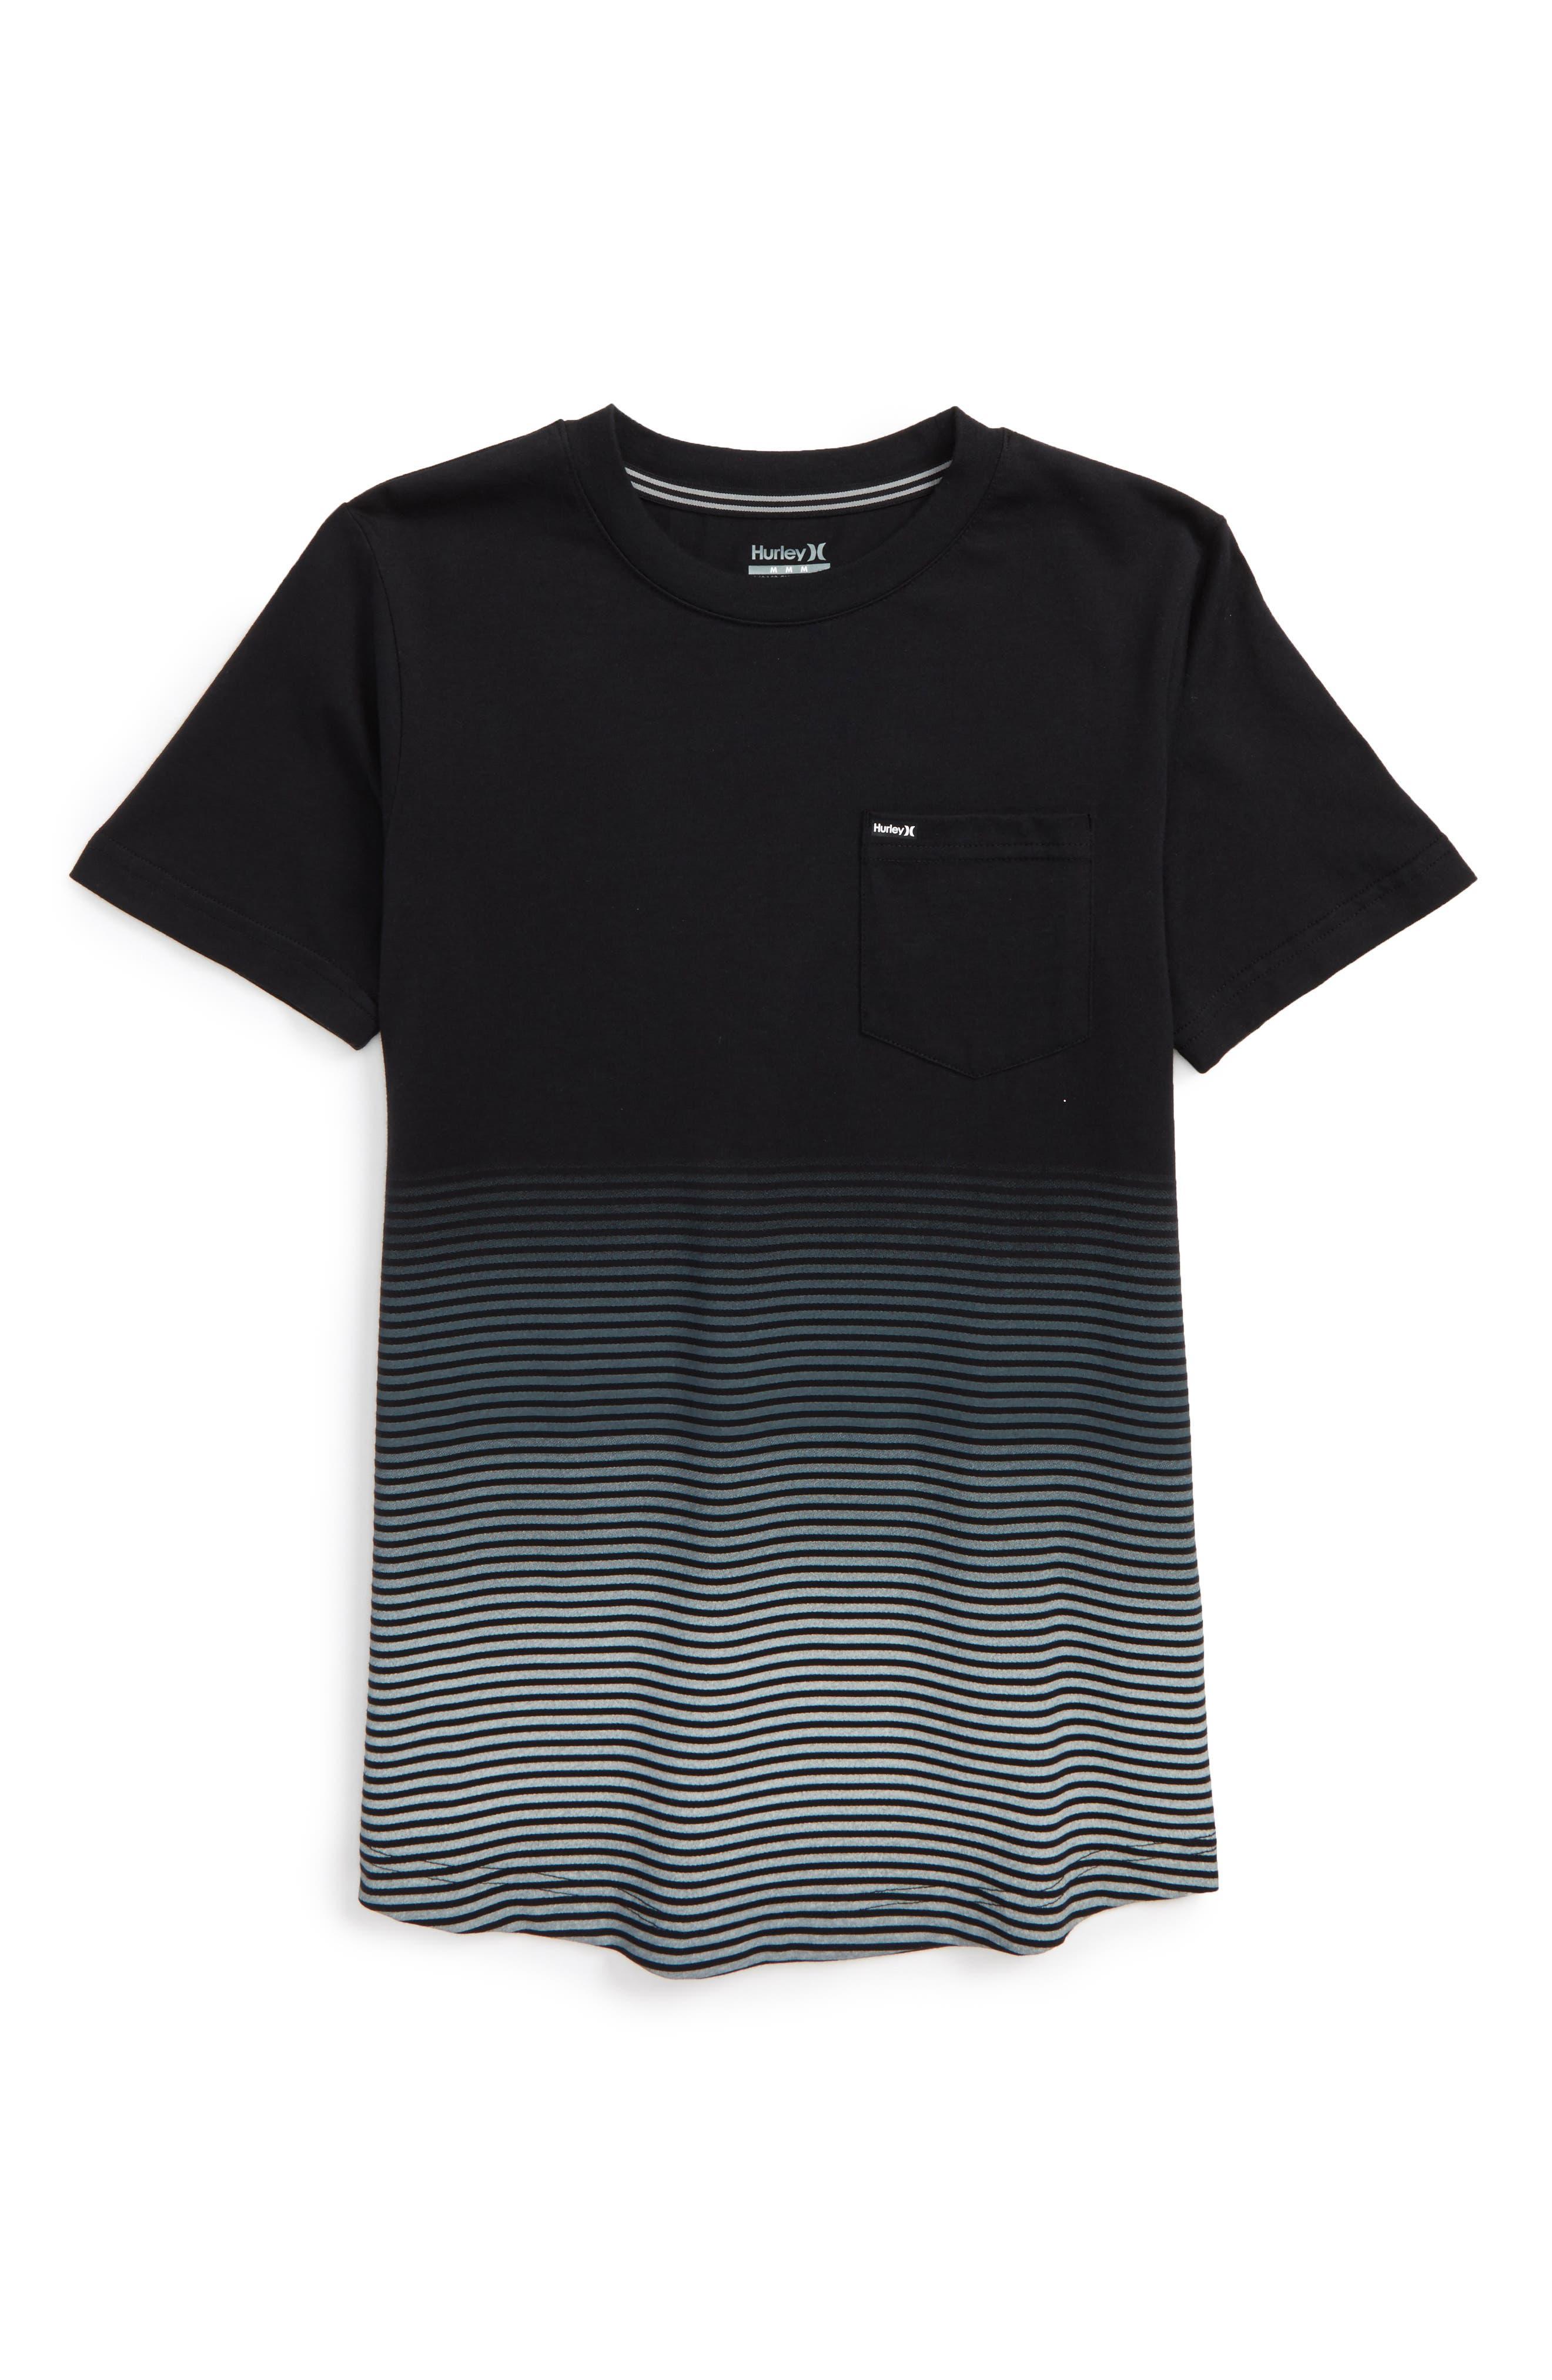 HURLEY Ombré Stripe T-Shirt